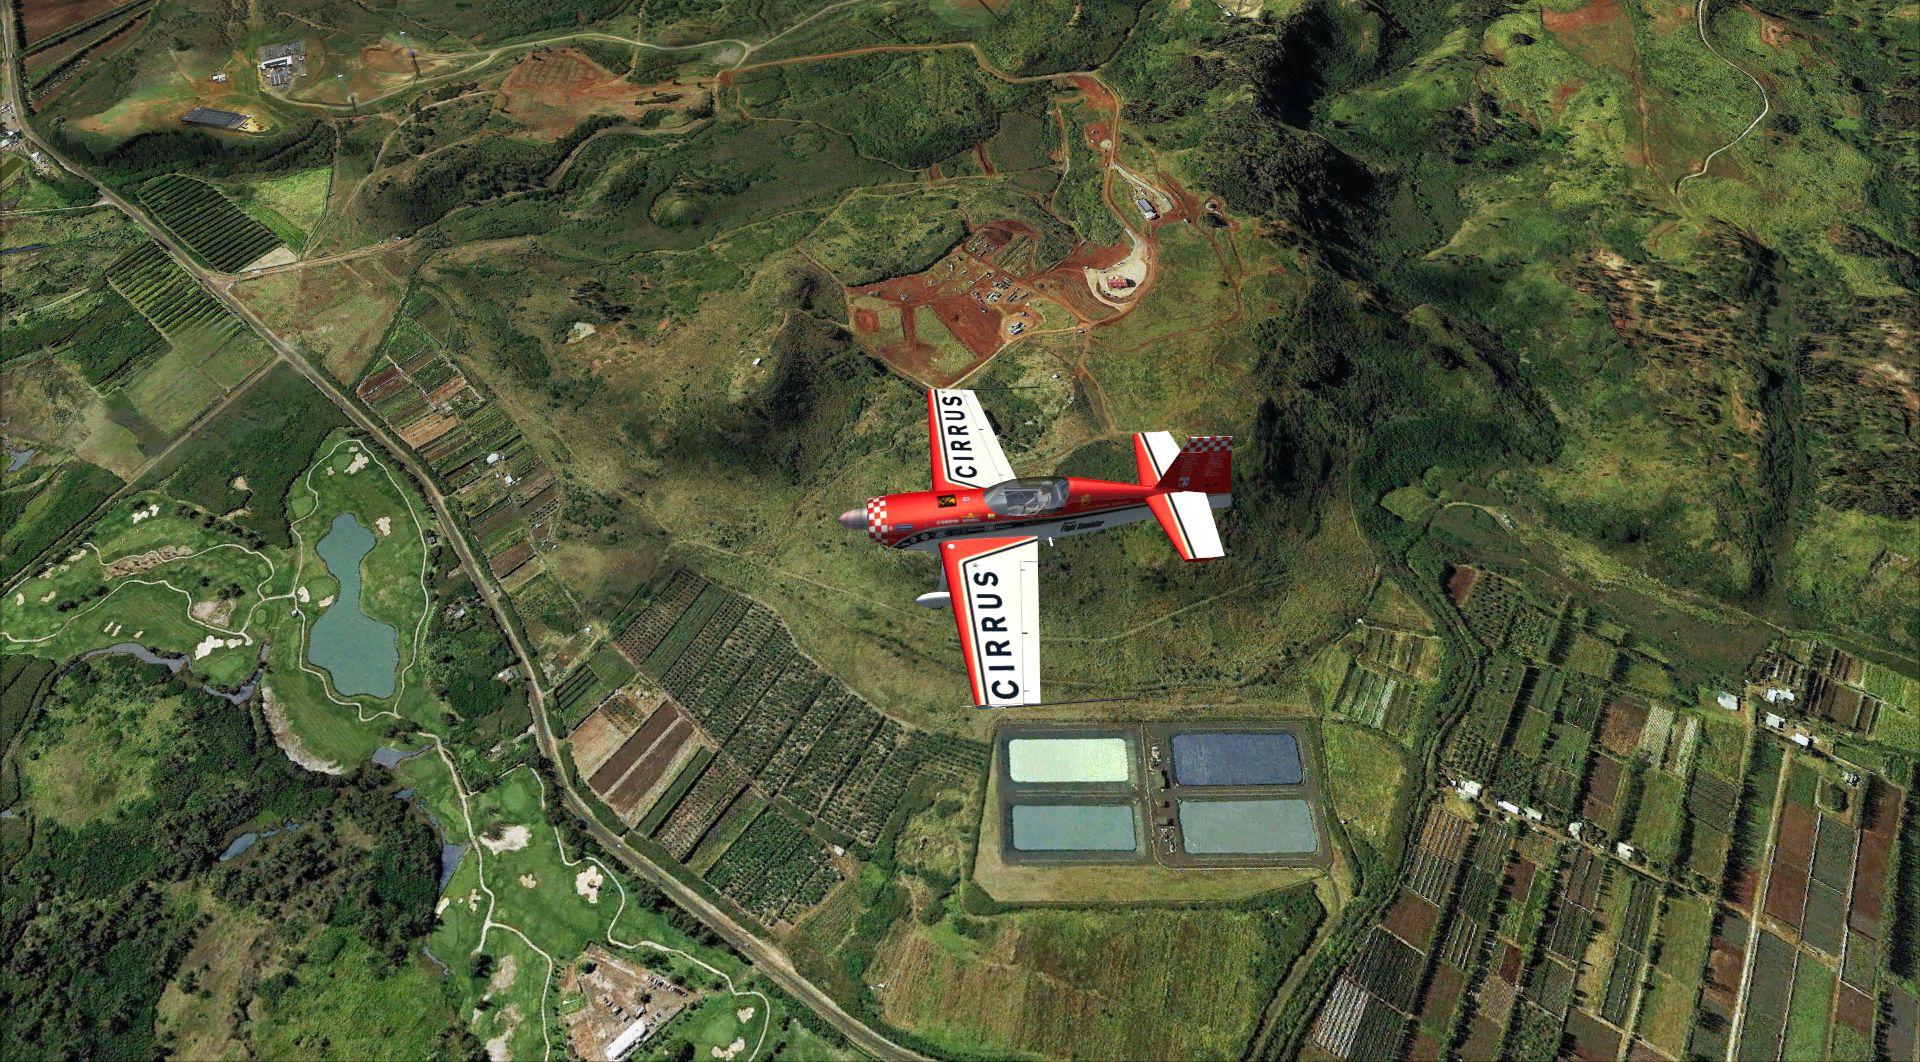 2001_hawaii20_2020-1-q5j0h.jpg